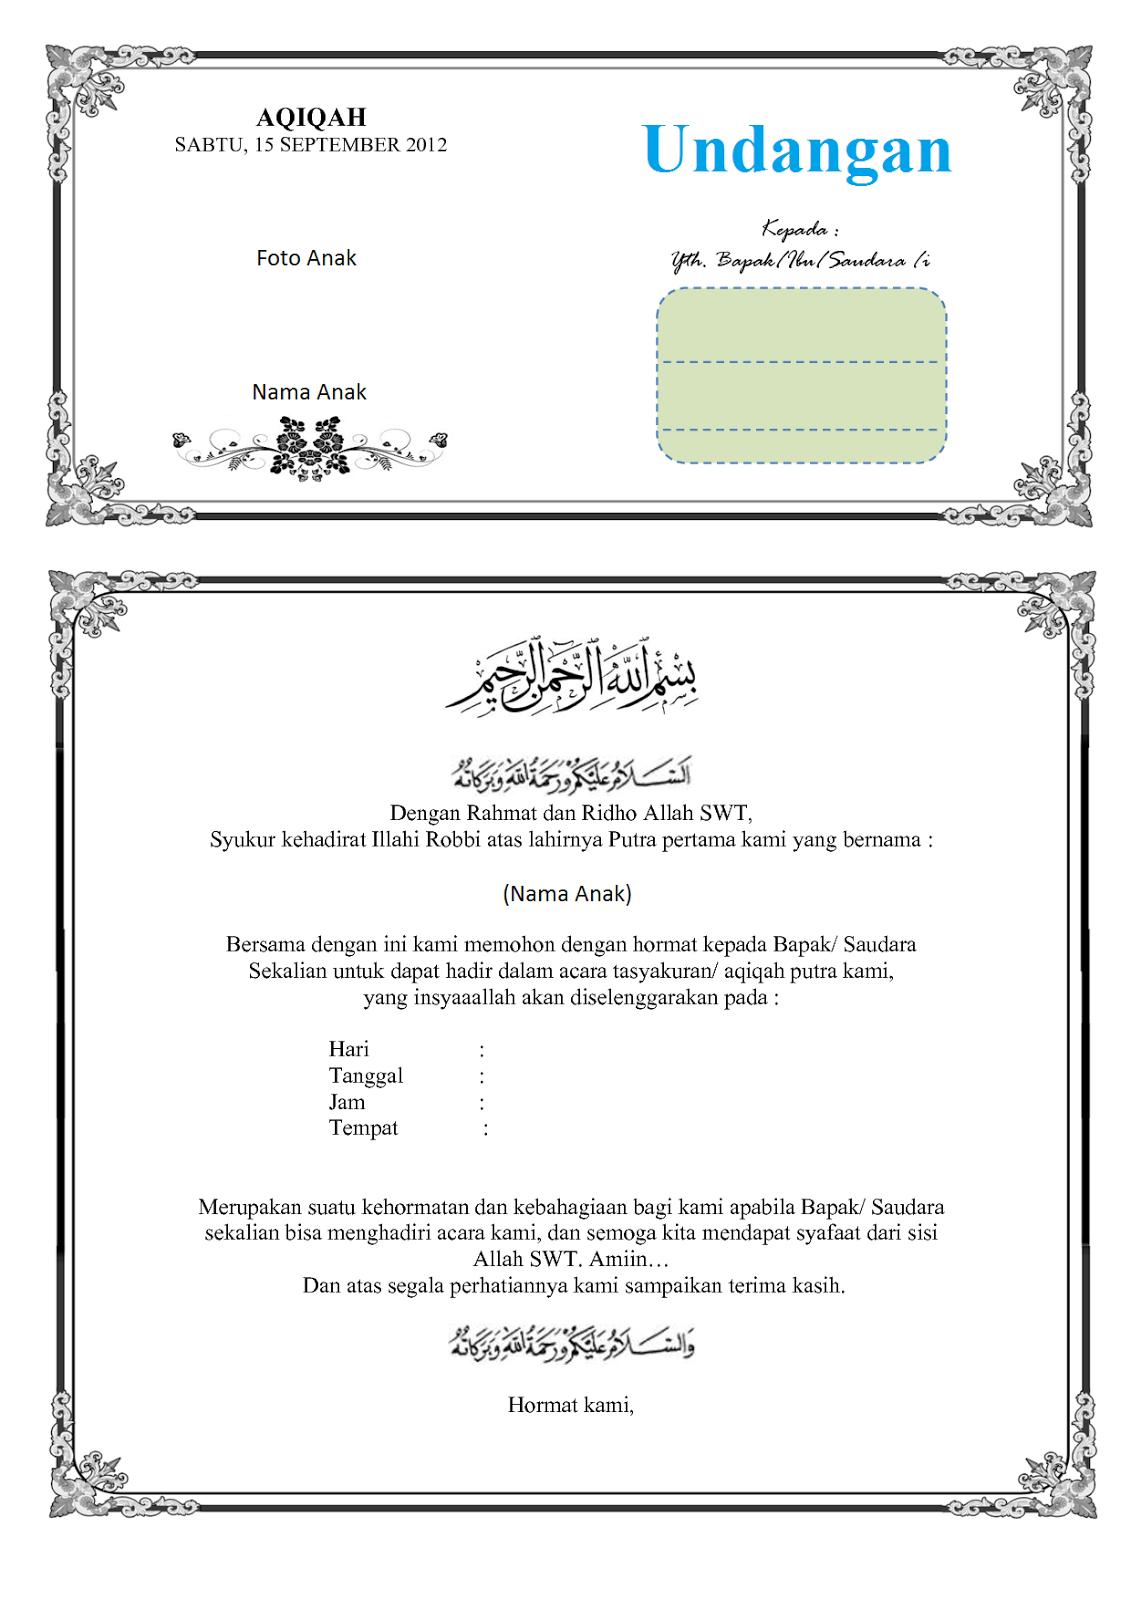 Dan di bawah inisalah satu contoh dari beberapa contoh surat undangan